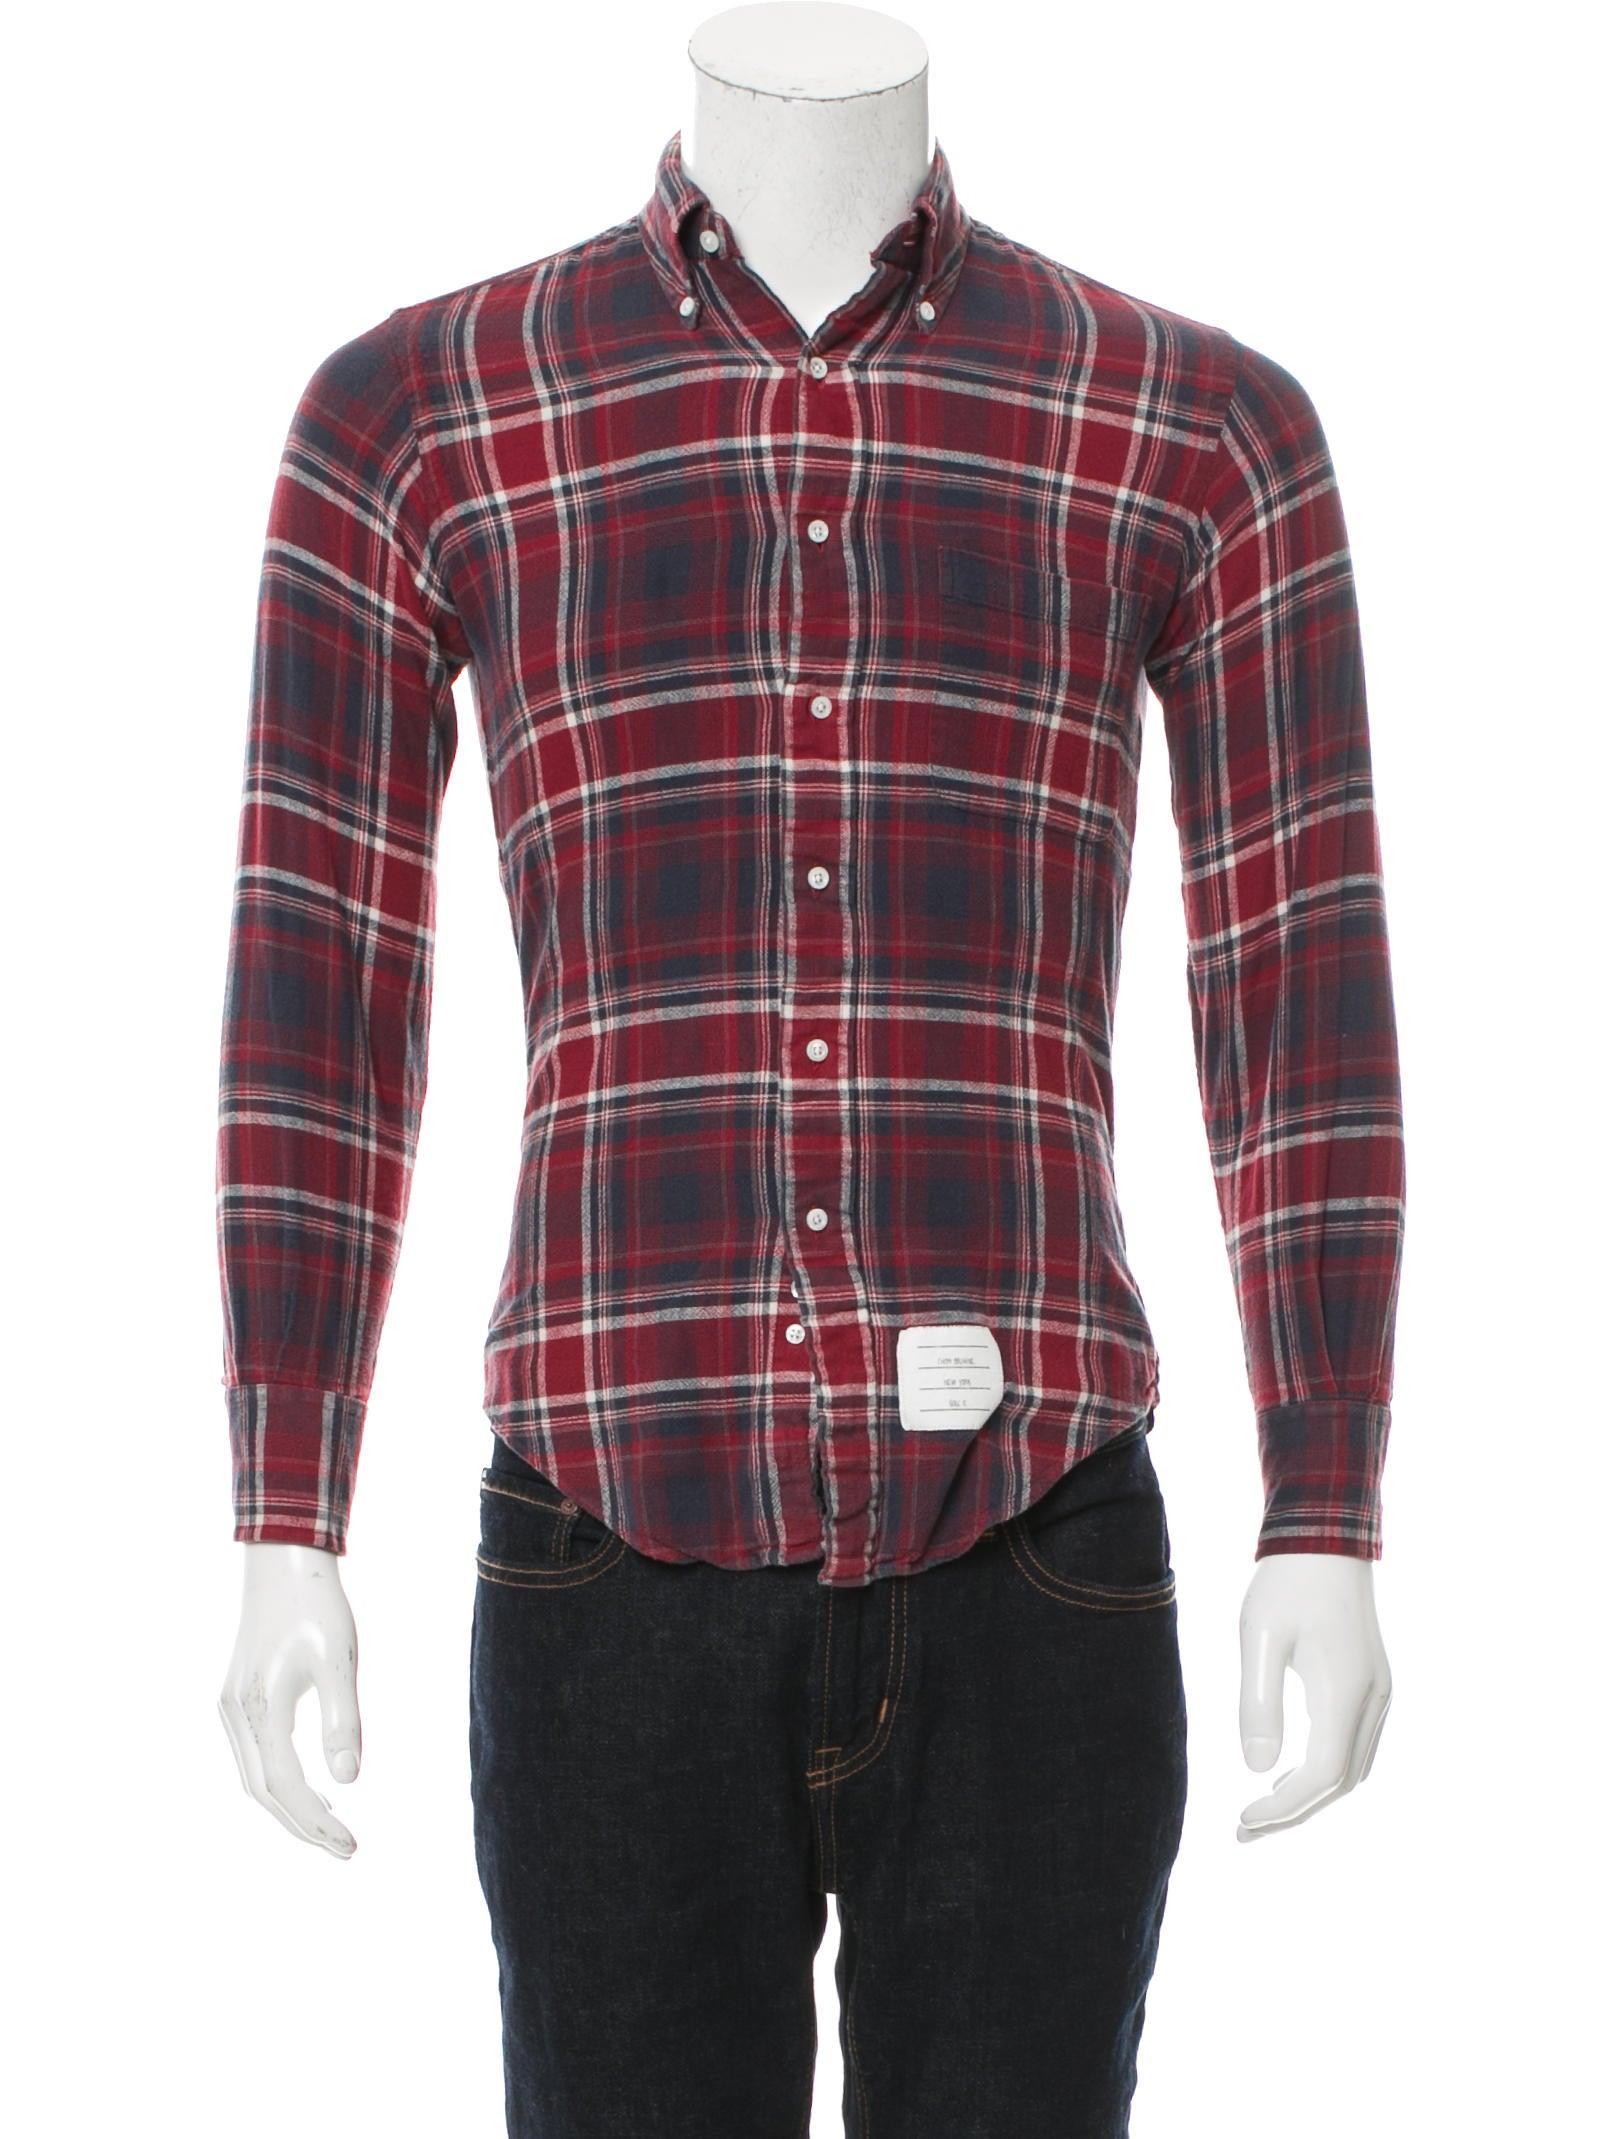 Thom browne plaid button up shirt clothing tho22207 for Thom browne shirt sale